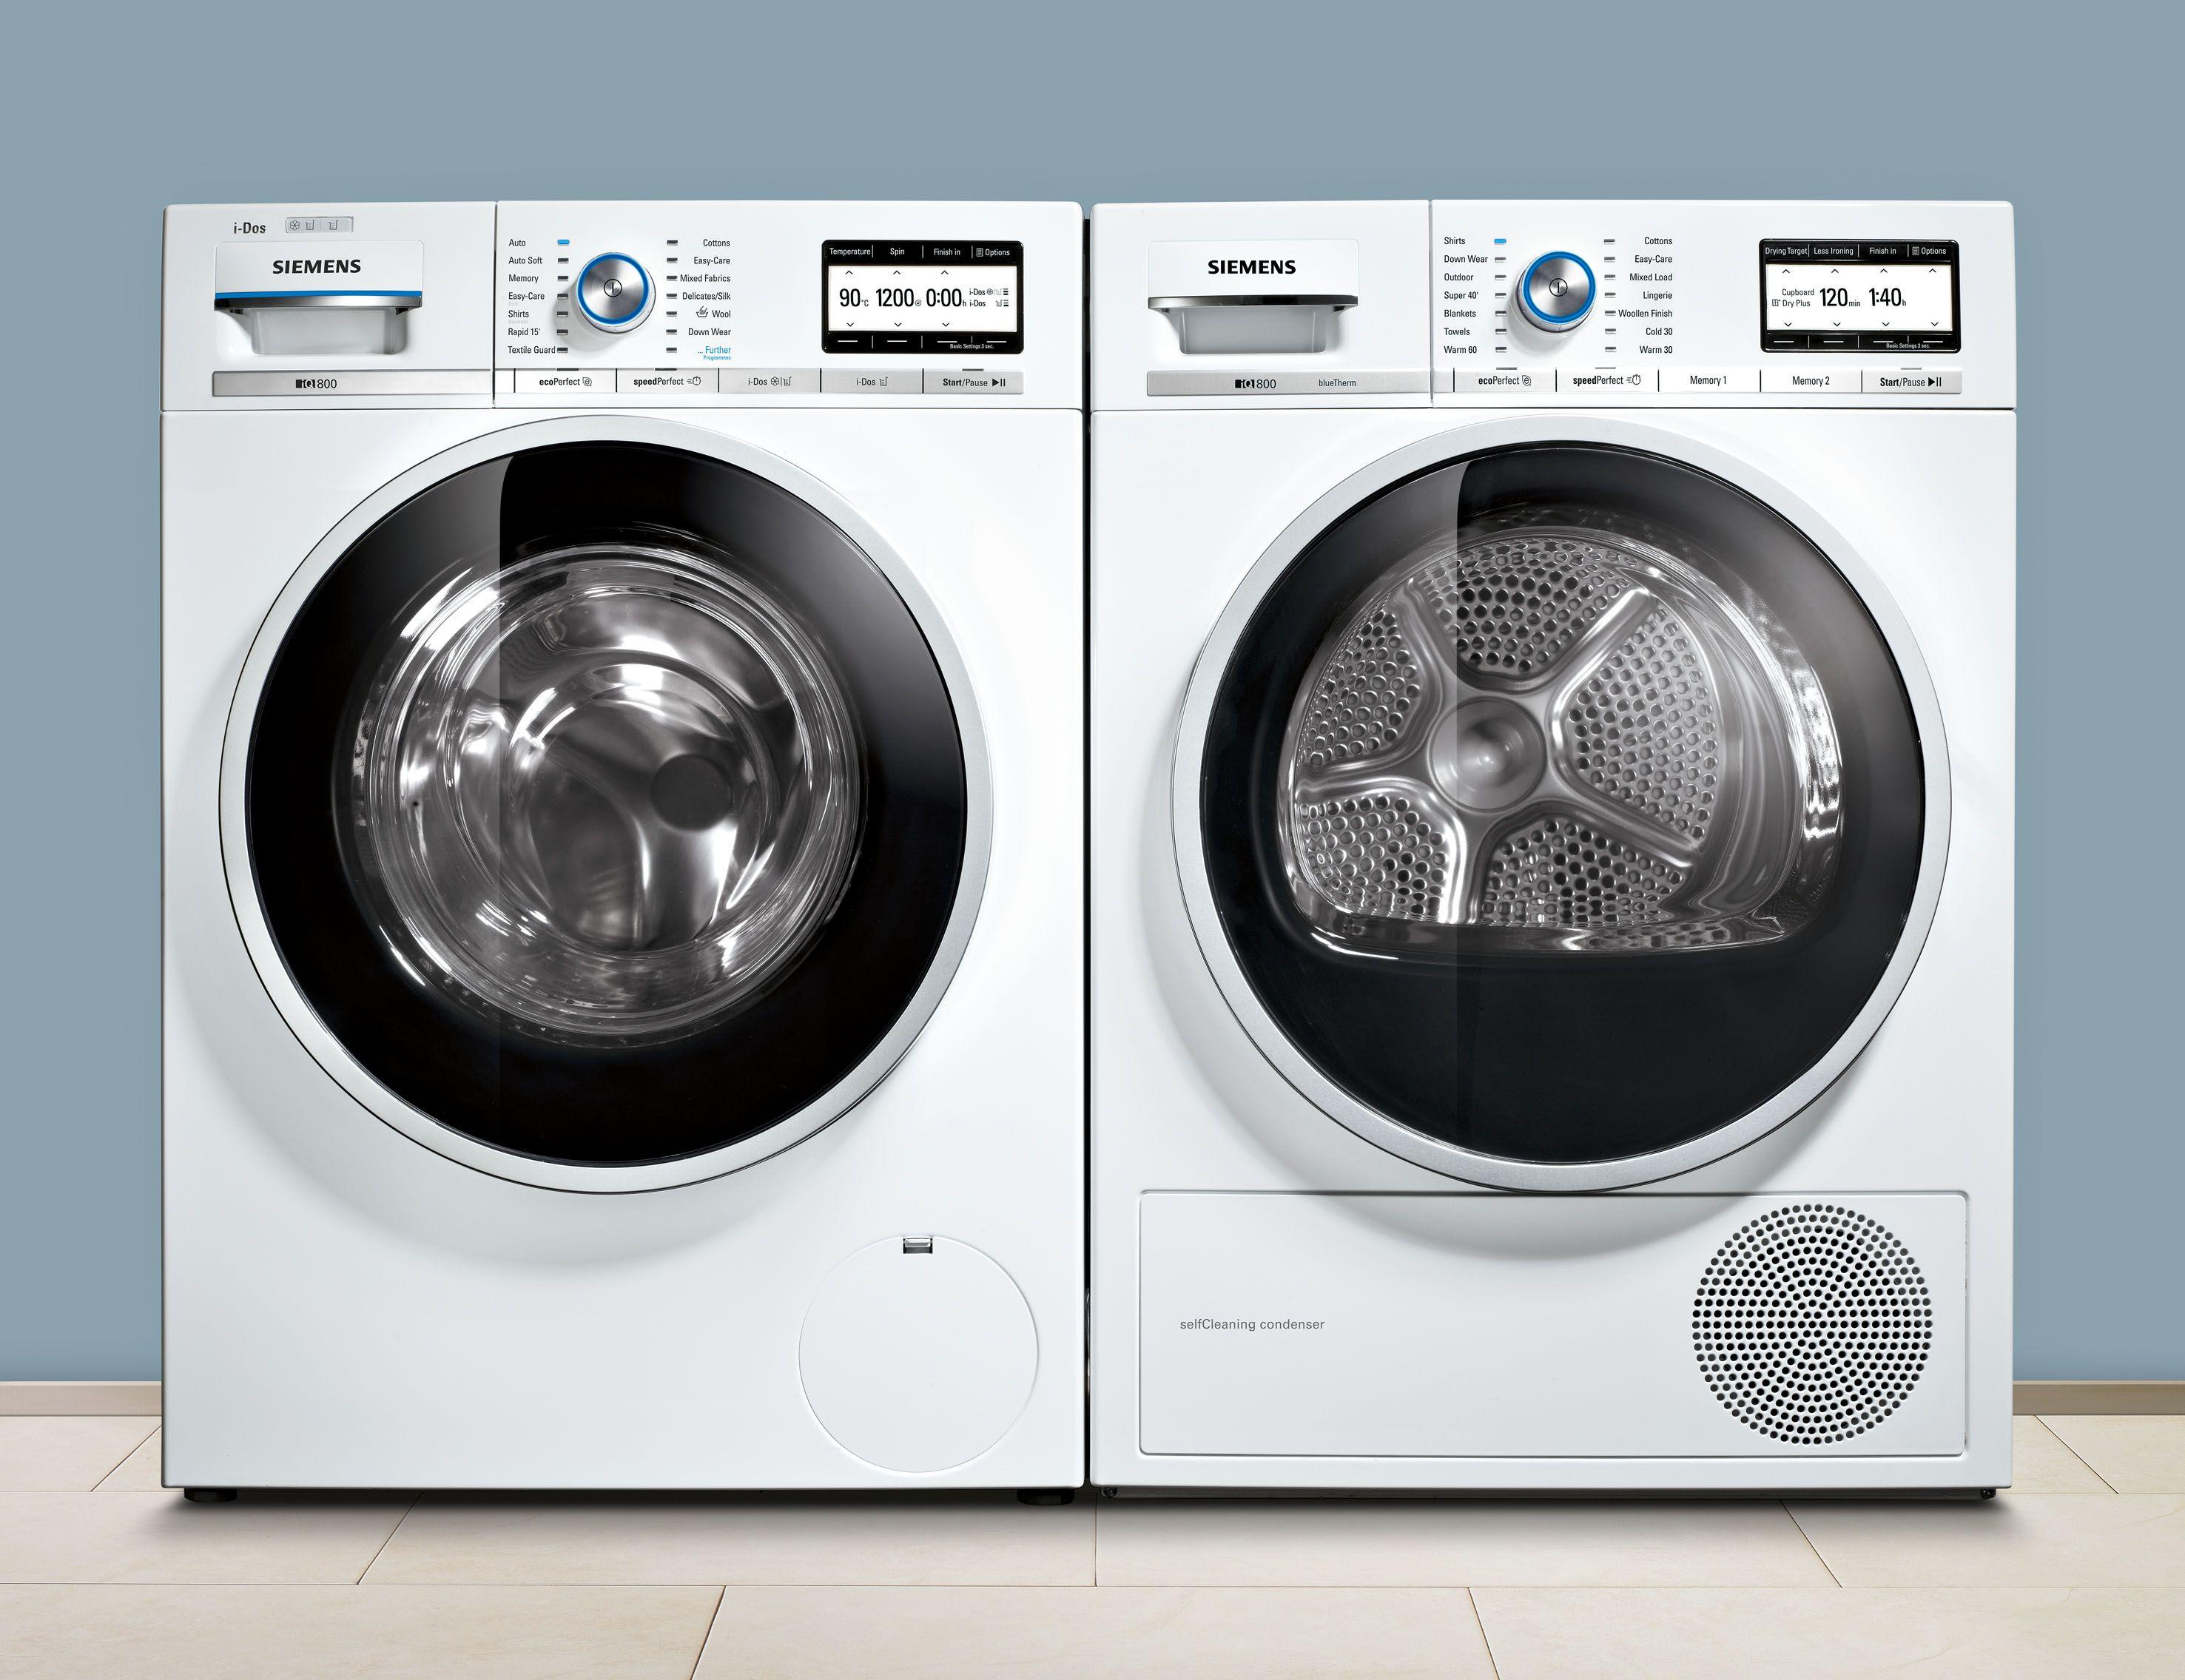 Siemens iq 800 master class washer & dryer Tasarım